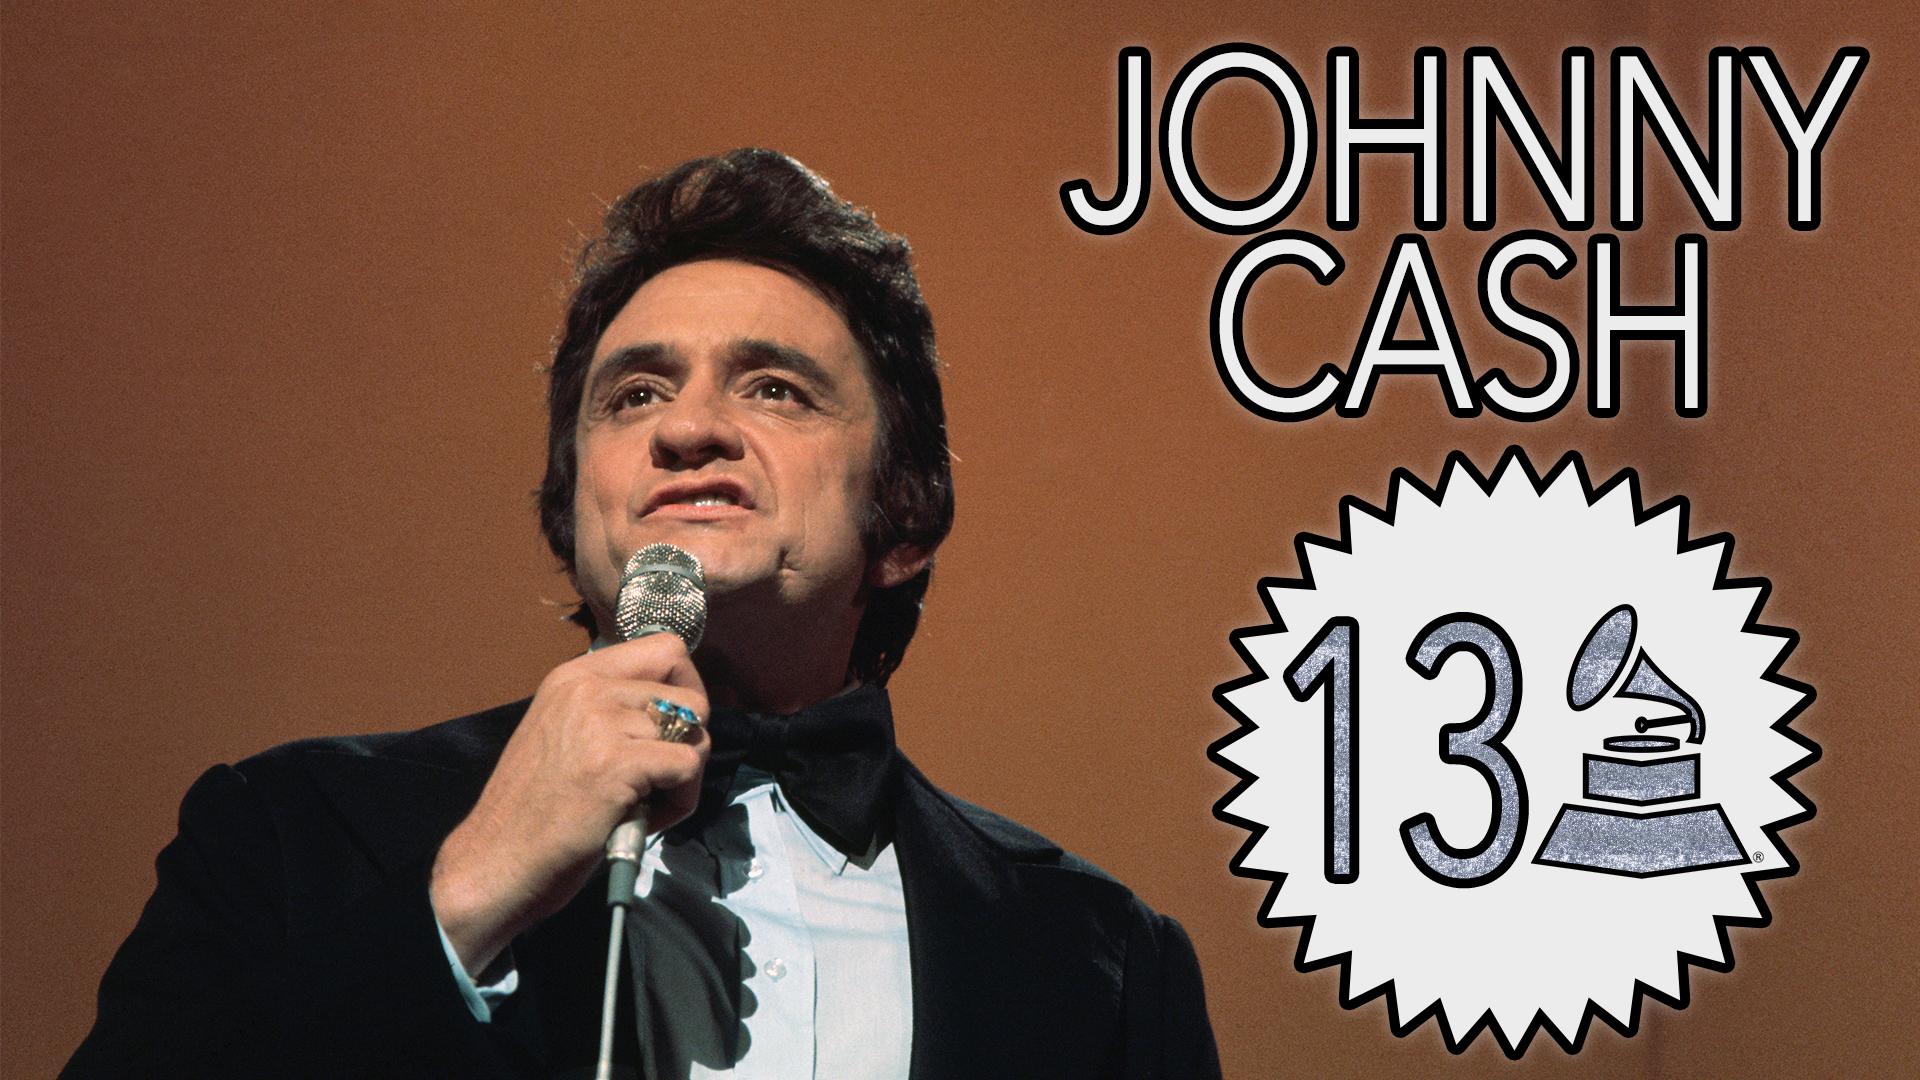 Johnny Cash with 13 GRAMMY Awards